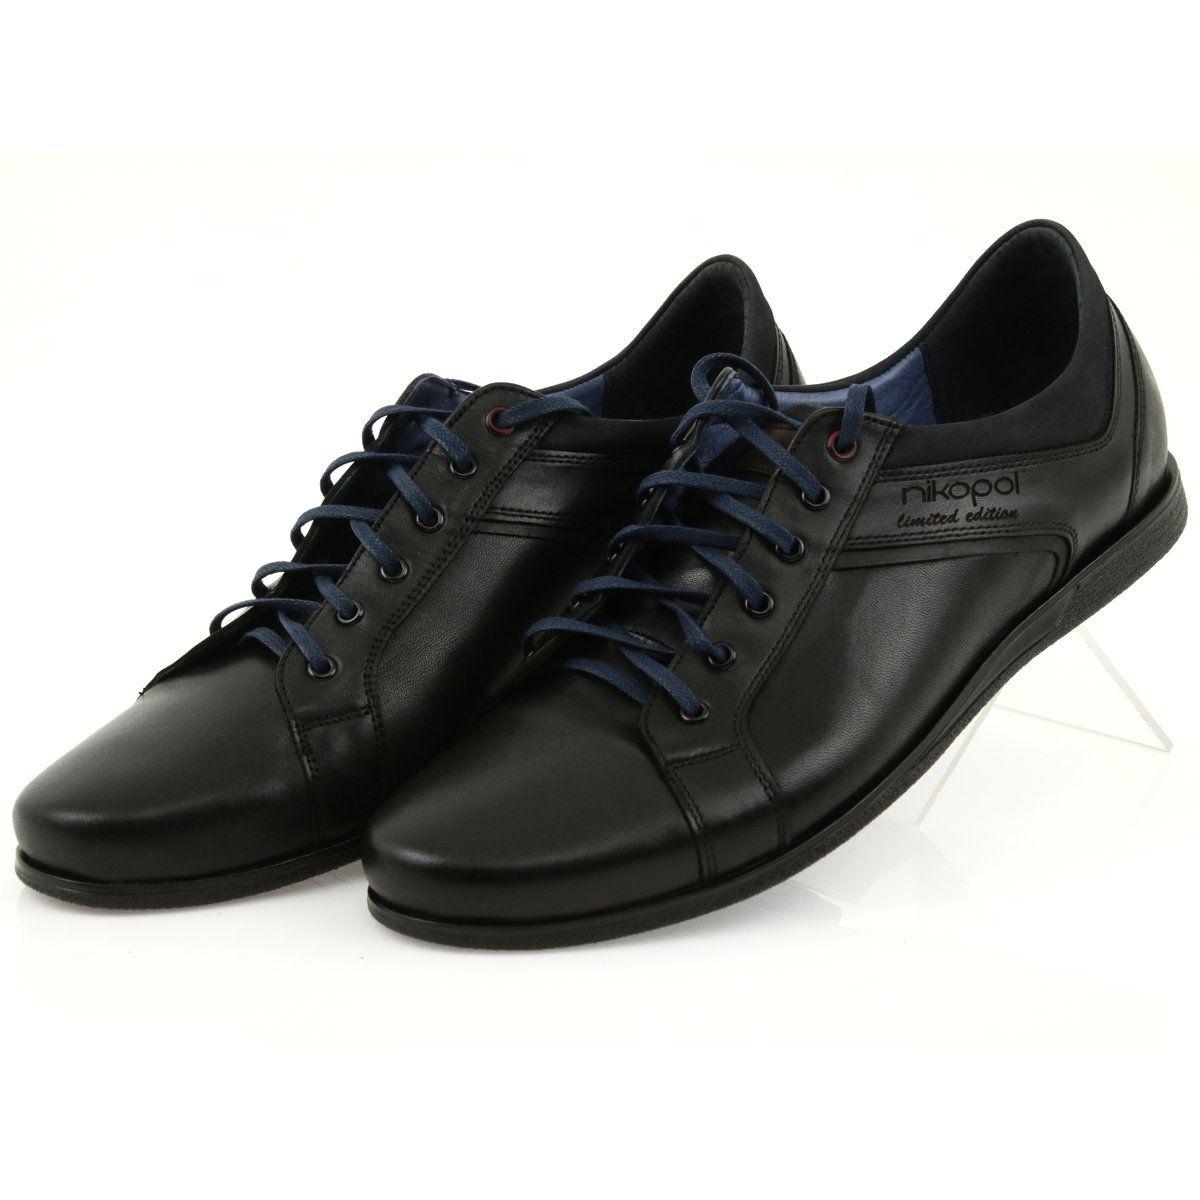 Polbuty Meskie Sportowe Nikopol 1703 Czarne Dress Shoes Men Sport Shoes Men Shoes